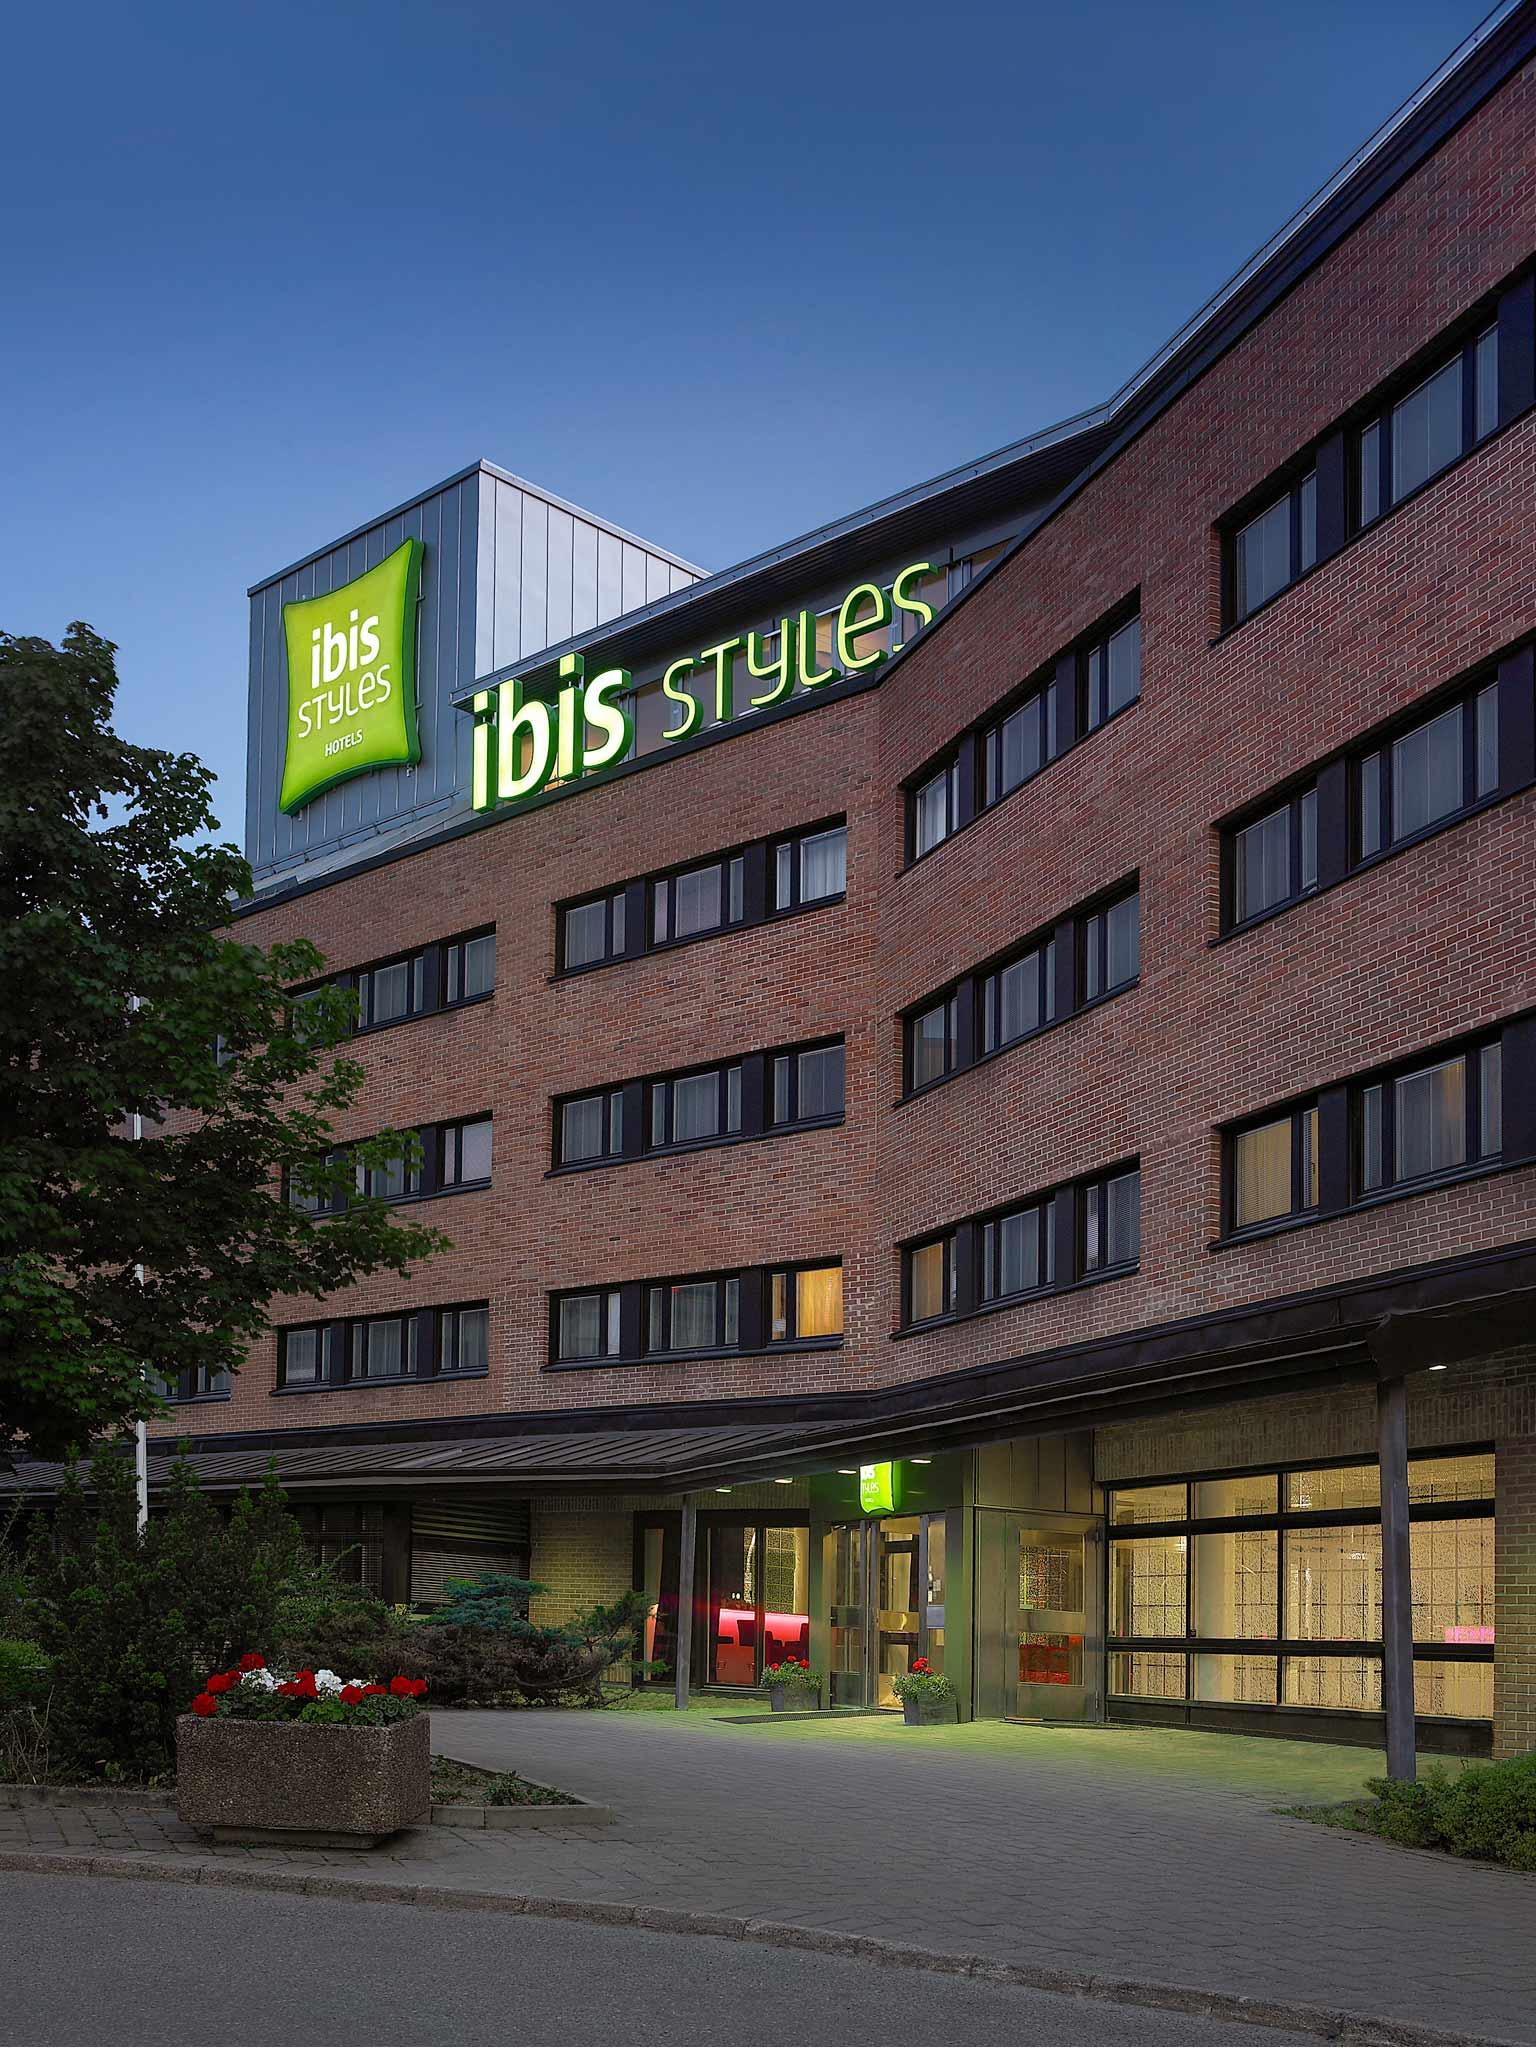 Ibis styles stockholm j rva affordable hotel in stockholm for Hotel stockholm